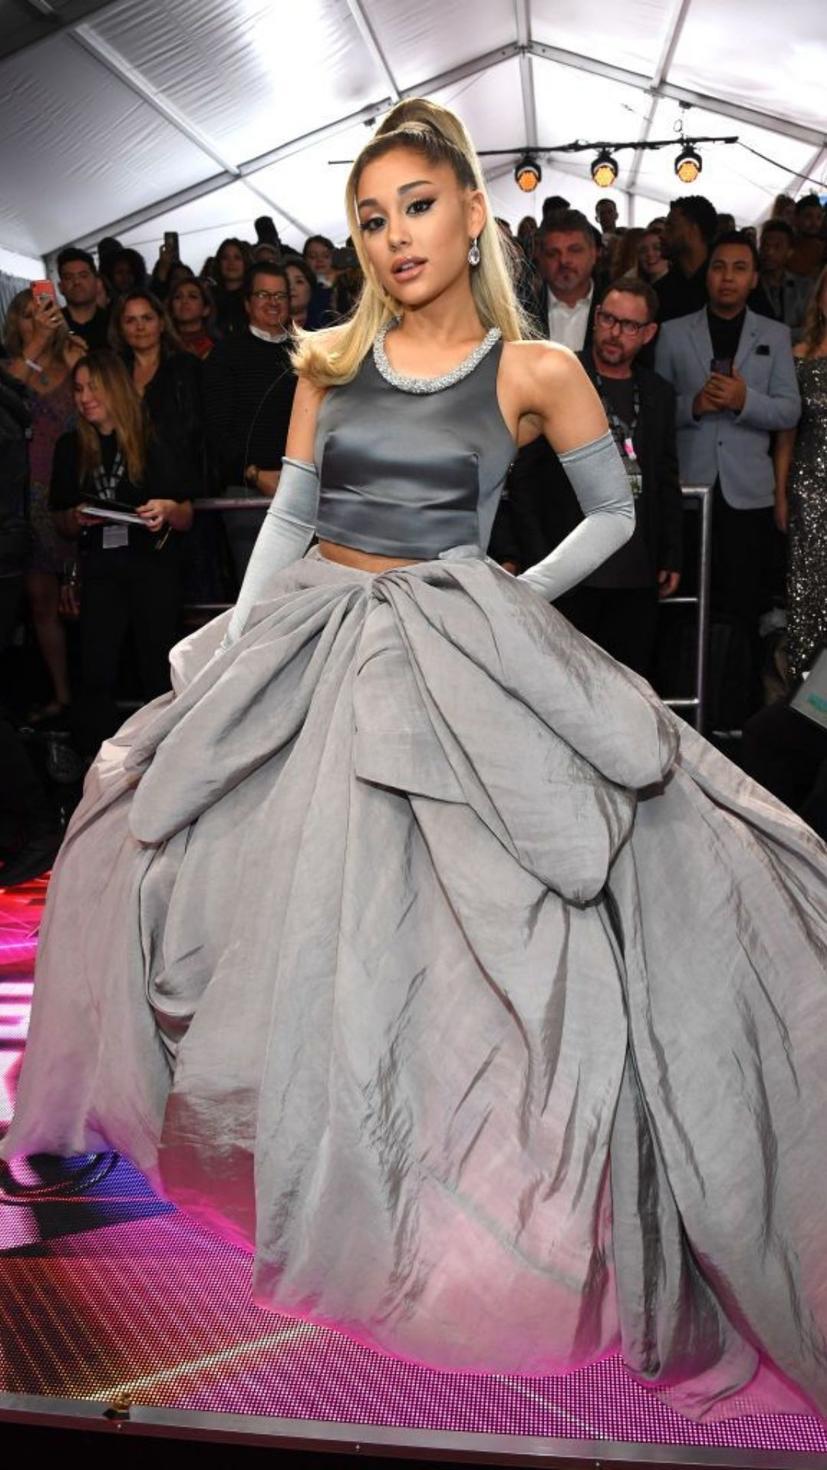 Ariana Grande's second Grammys dress was a custom two-piece from Schiaparelli, along with Lorraine Schwartz jewellery